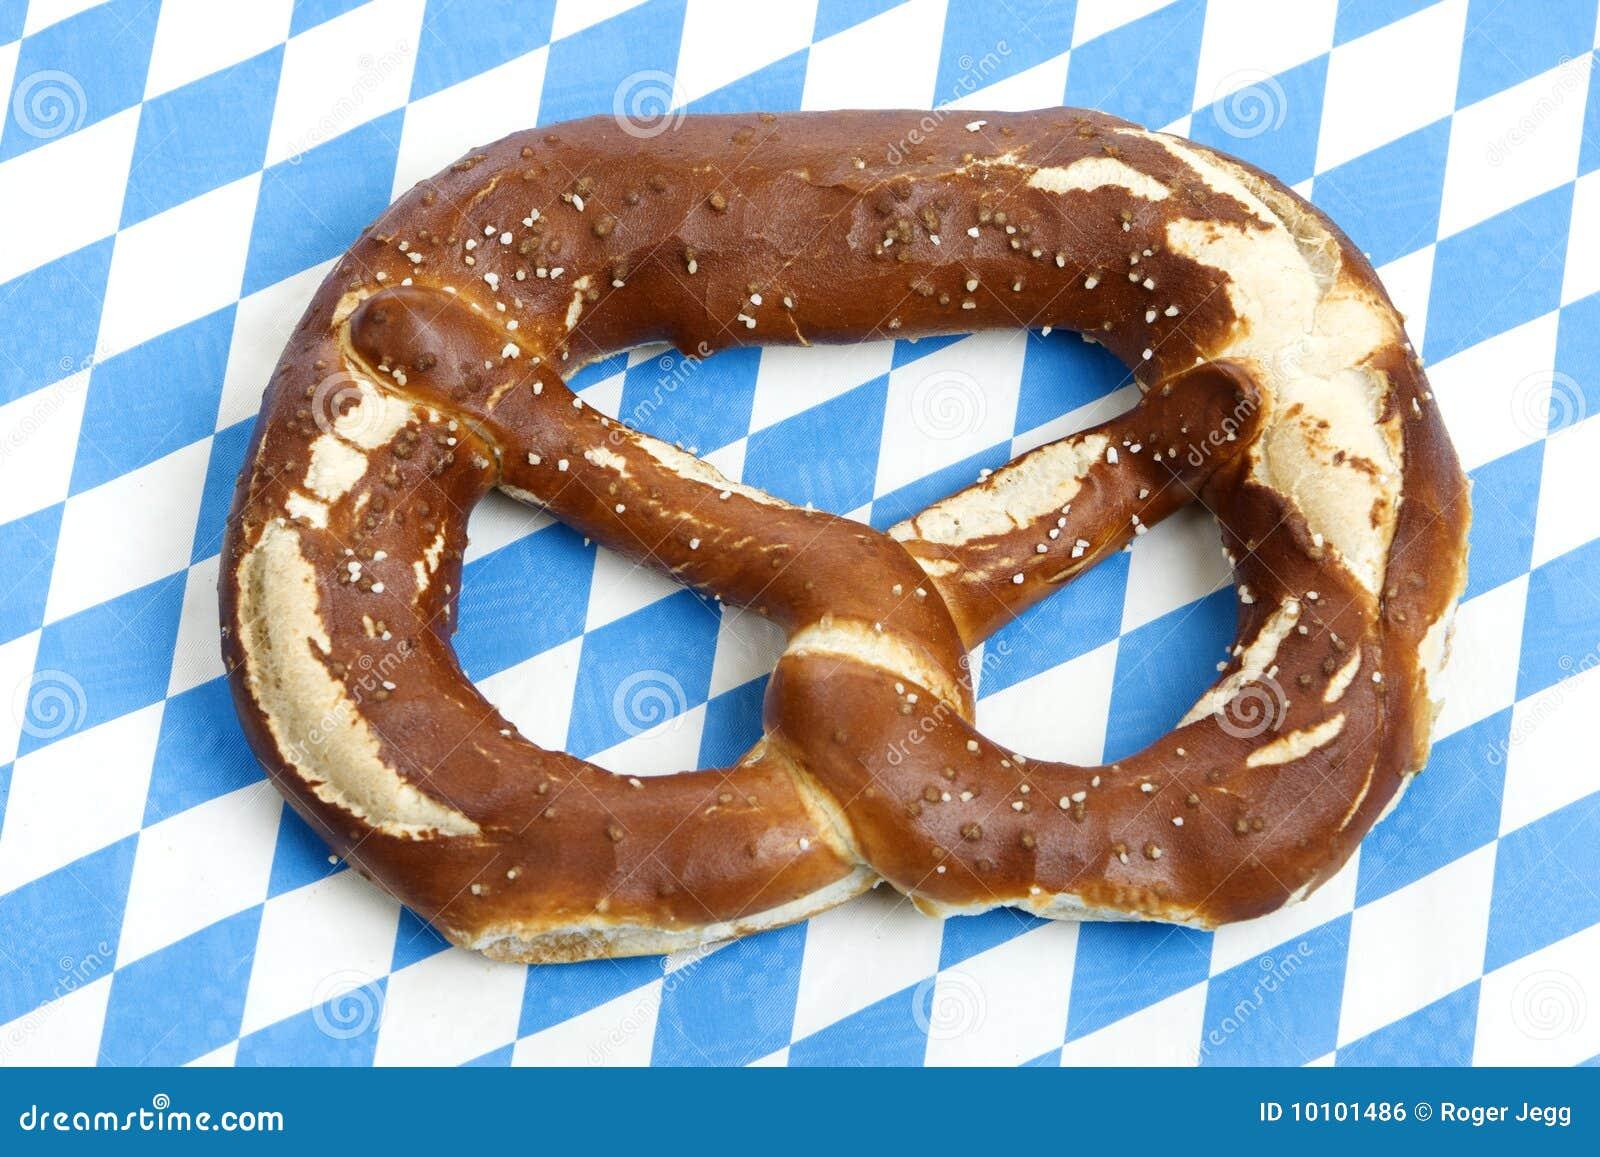 oktoberfest pretzel stock photo image of beer alcohol 10101486